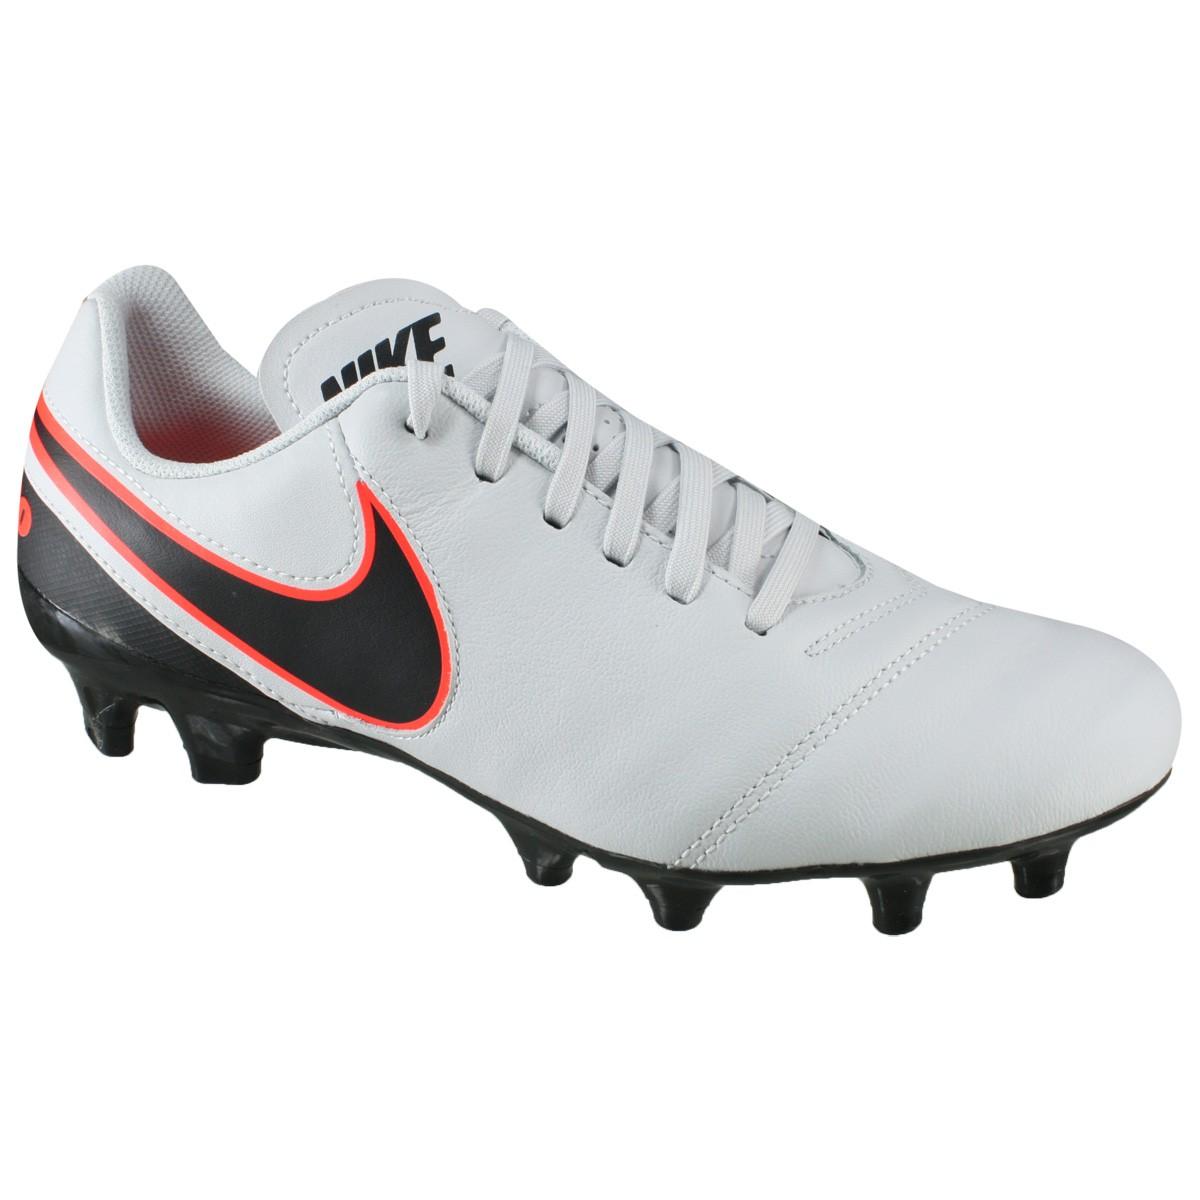 090bf81668b7 Chuteira Nike Tiempo Genio II Leather FG 819213-001 - Cinza ...